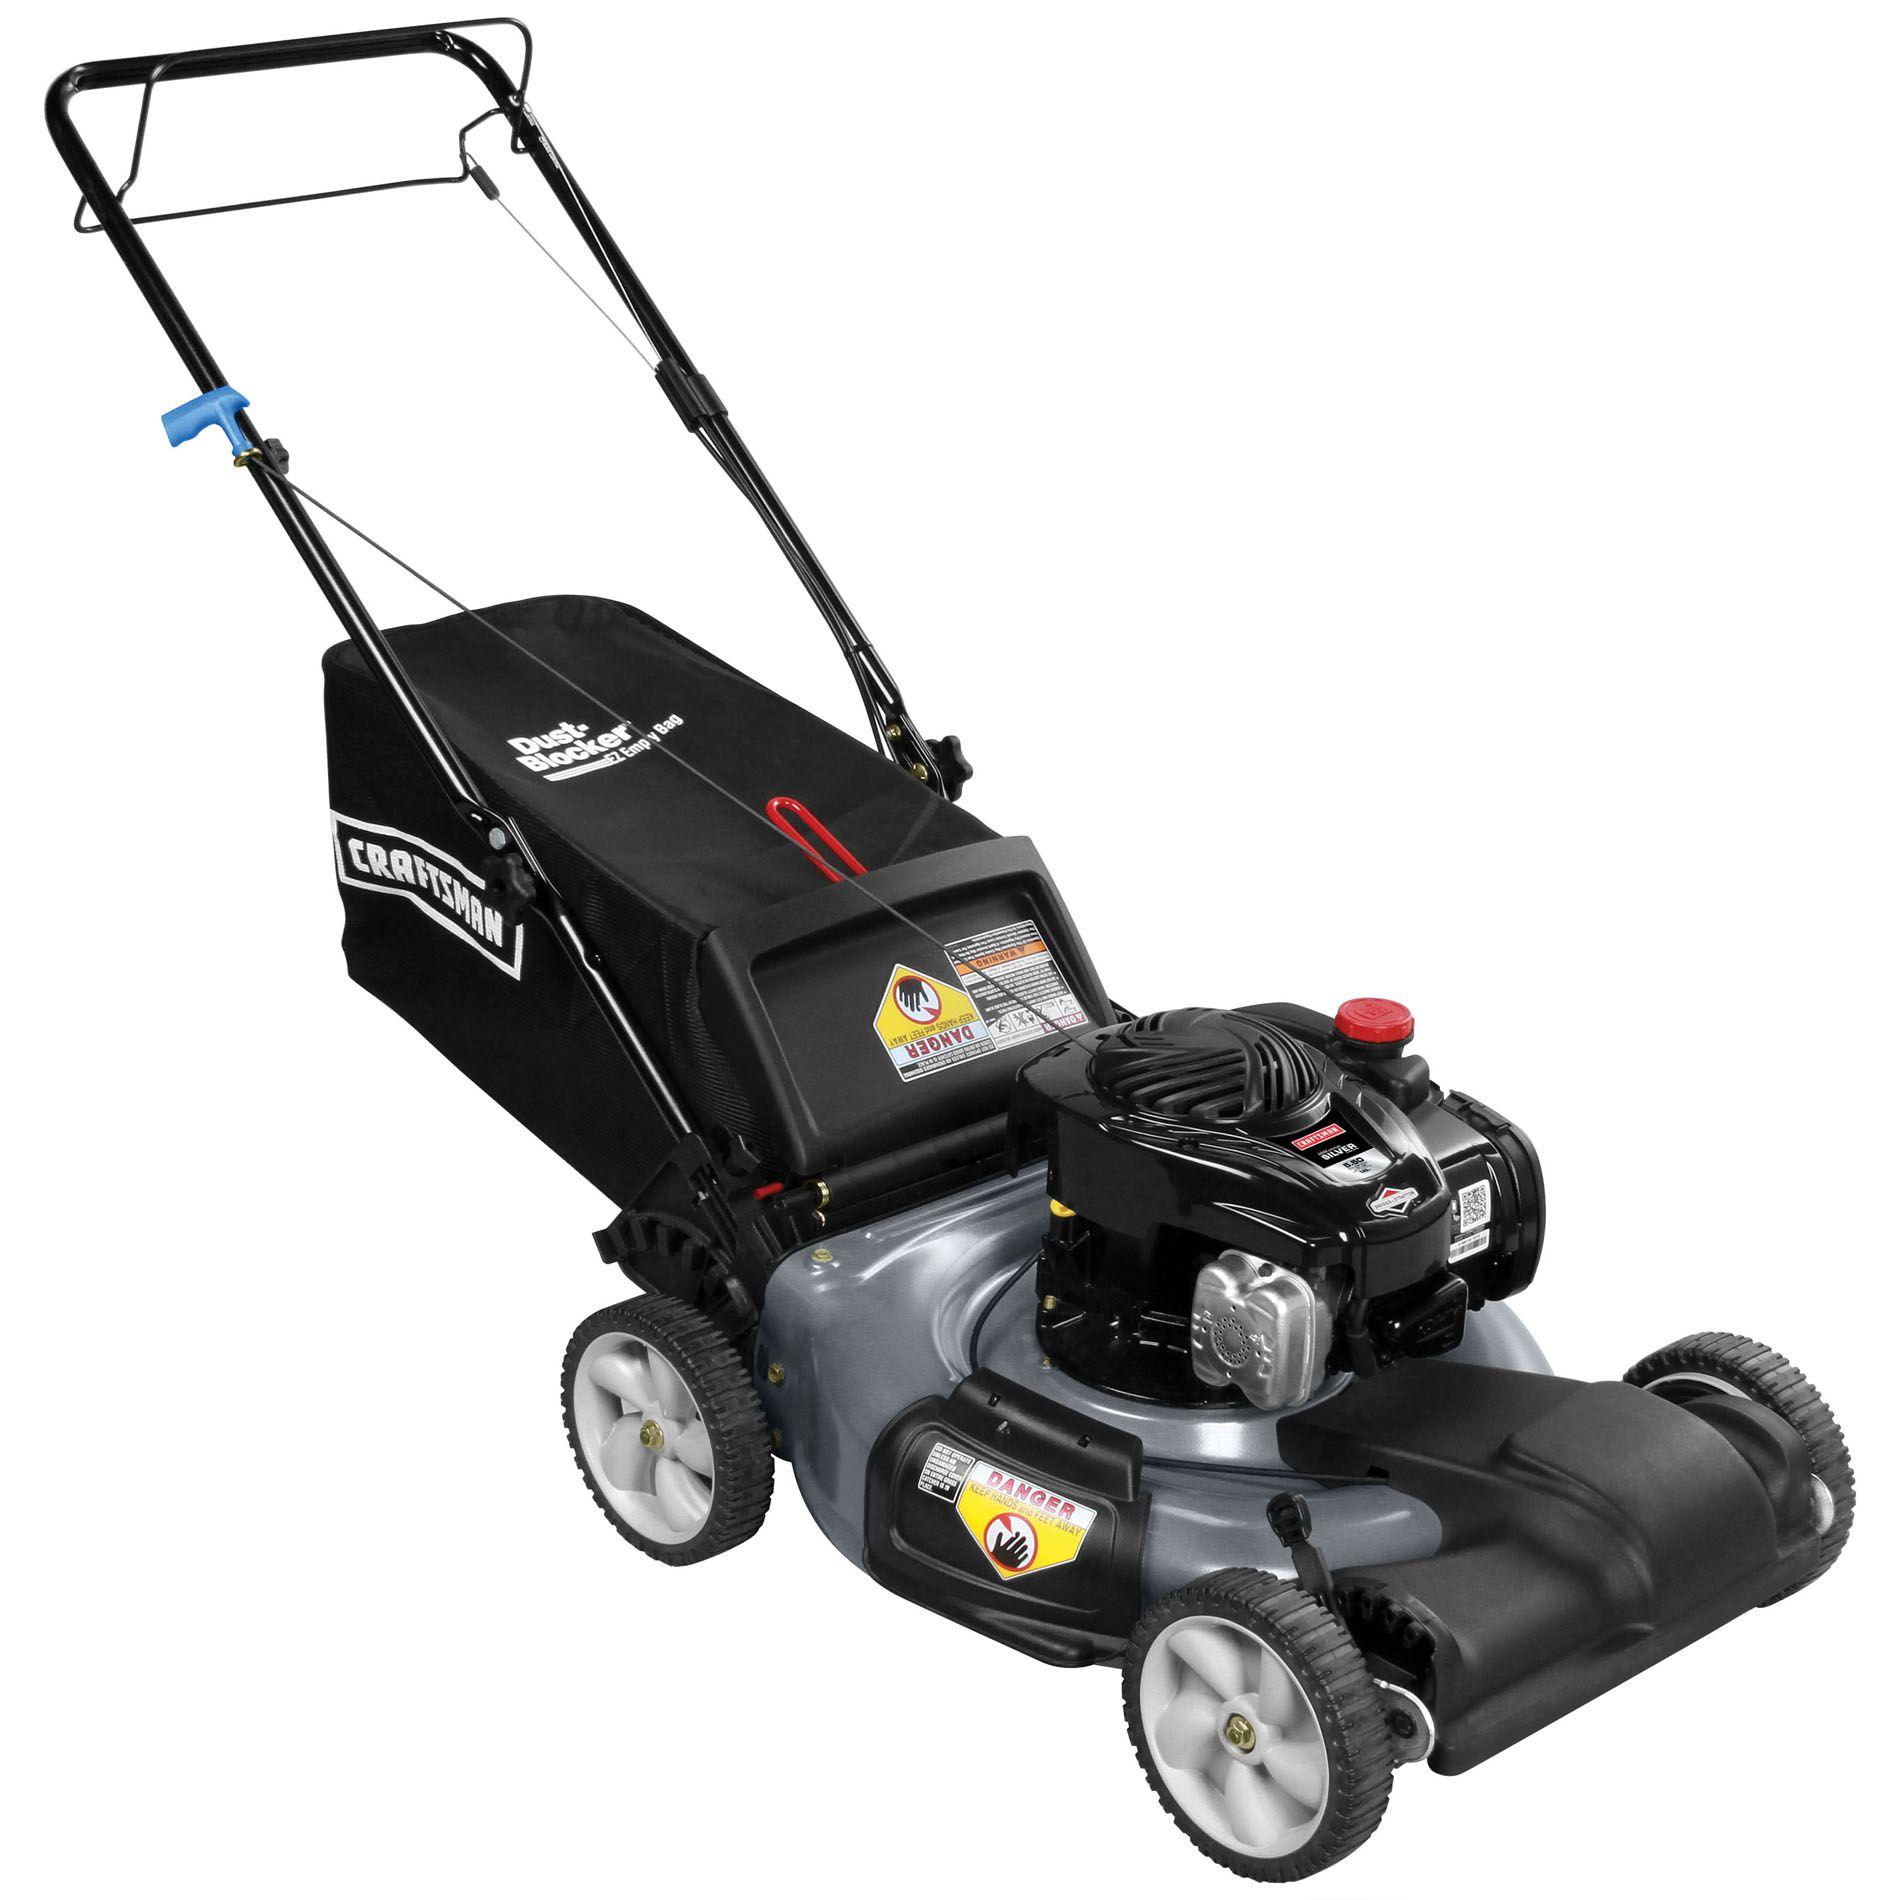 craftsman platinum 7.00 lawn mower manual